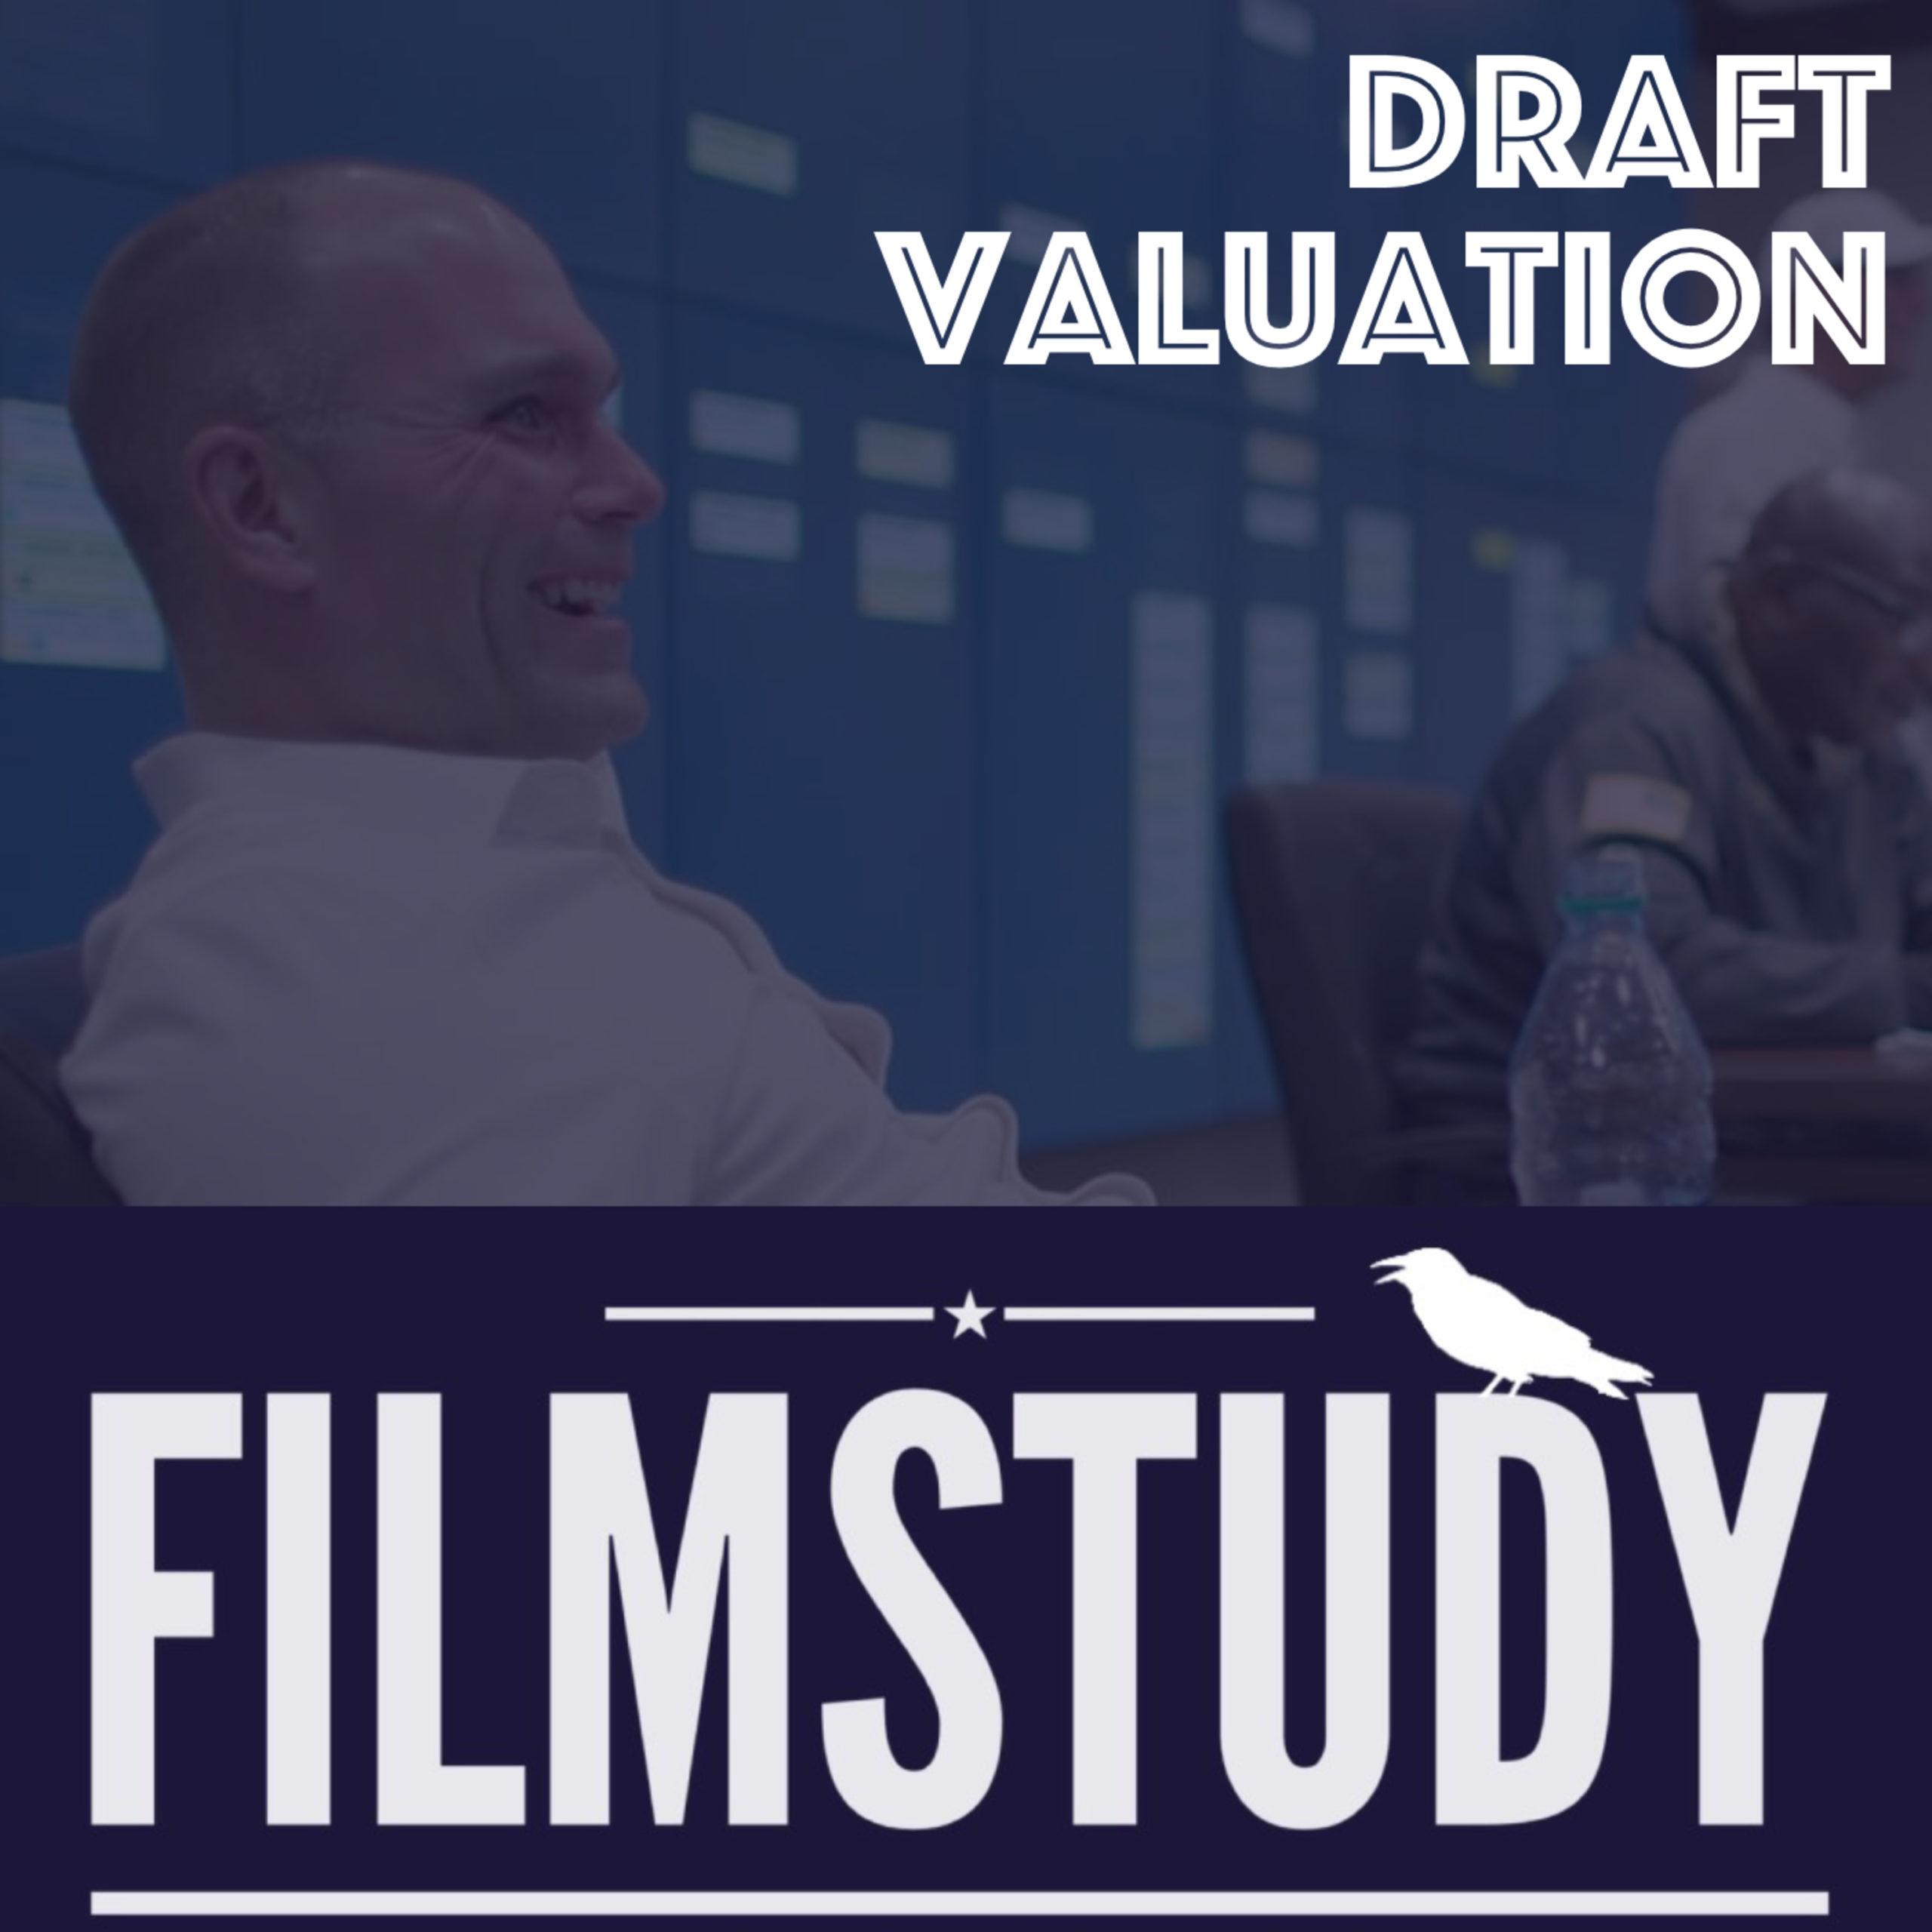 Draft Valuation